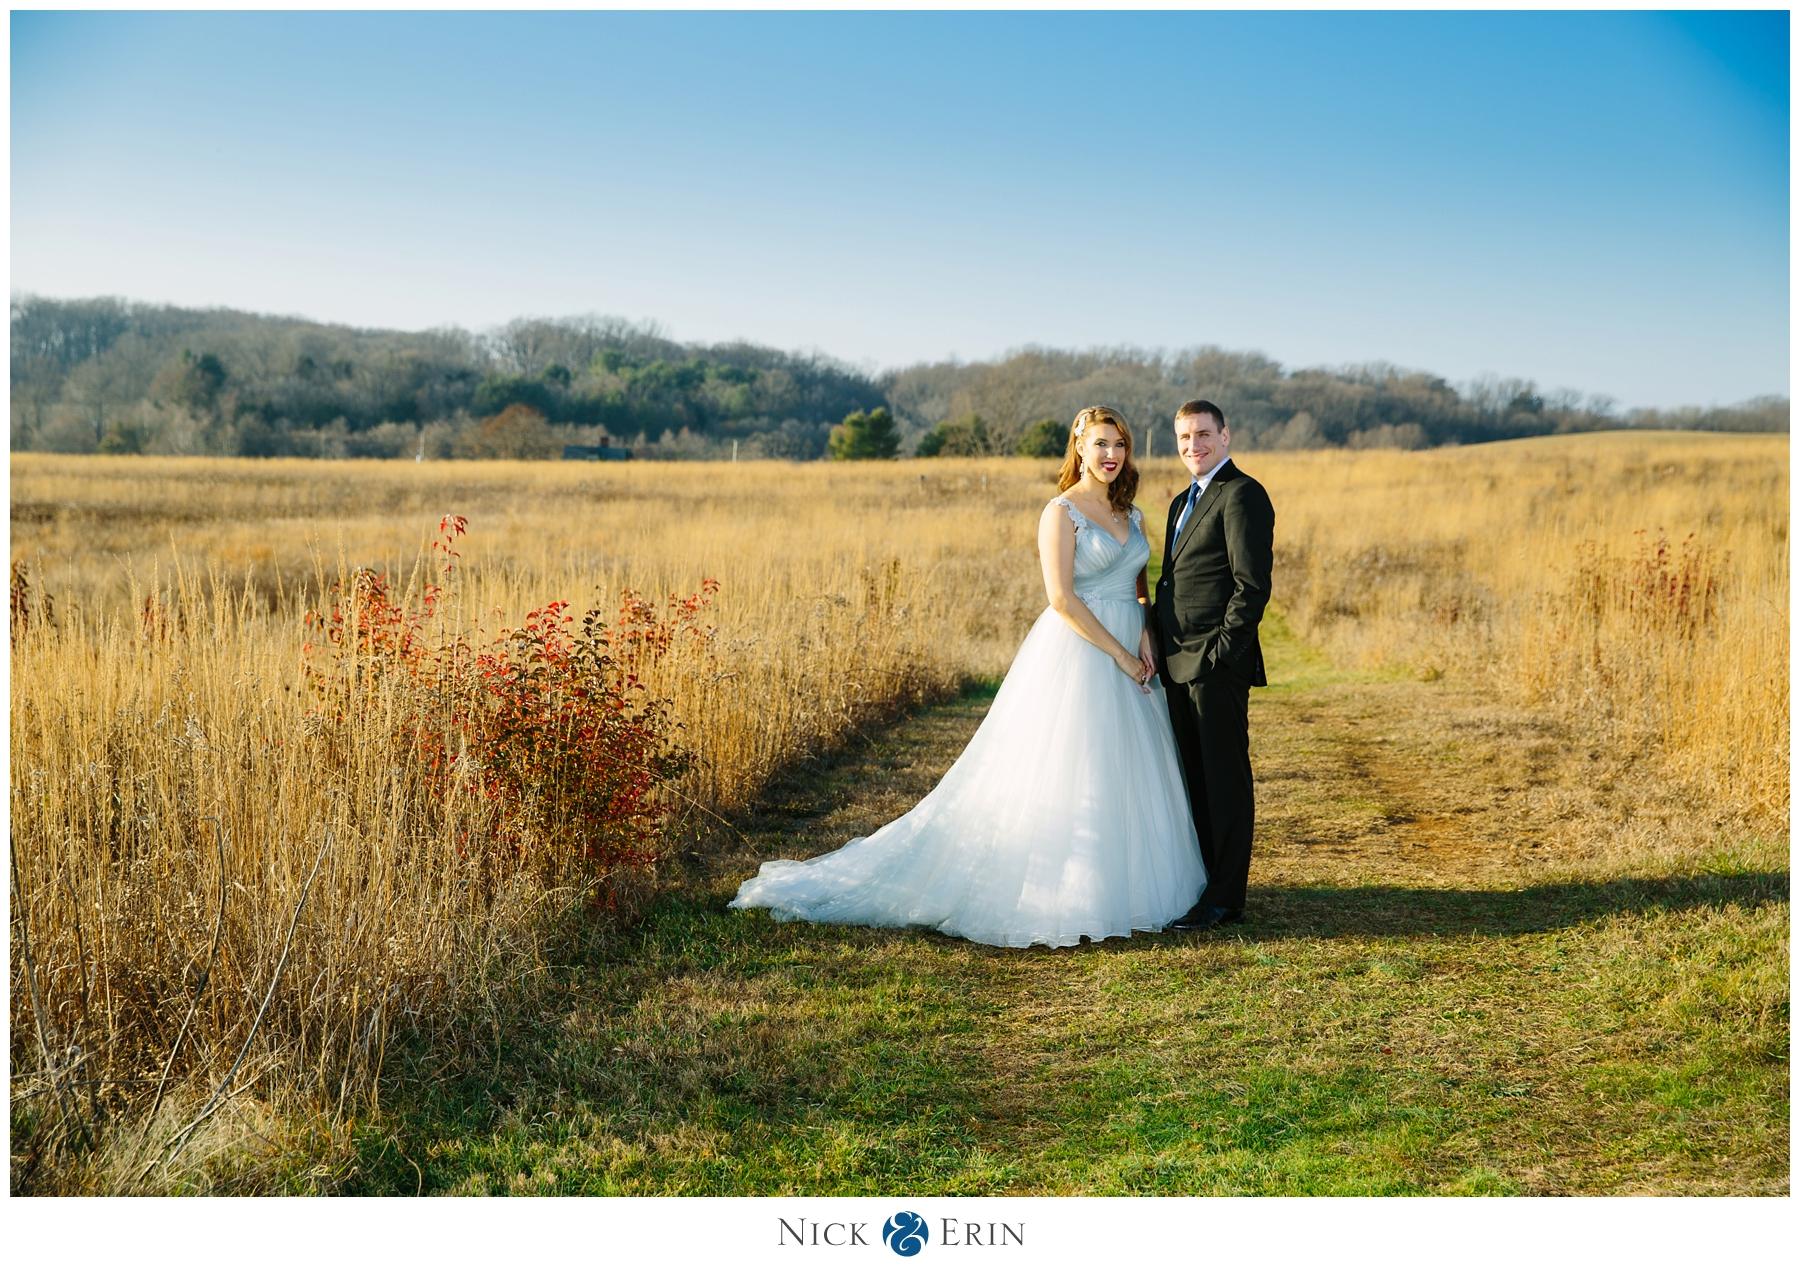 Donner_Photography_Mendenhall Inn Wedding_Blake & Kristina_0025